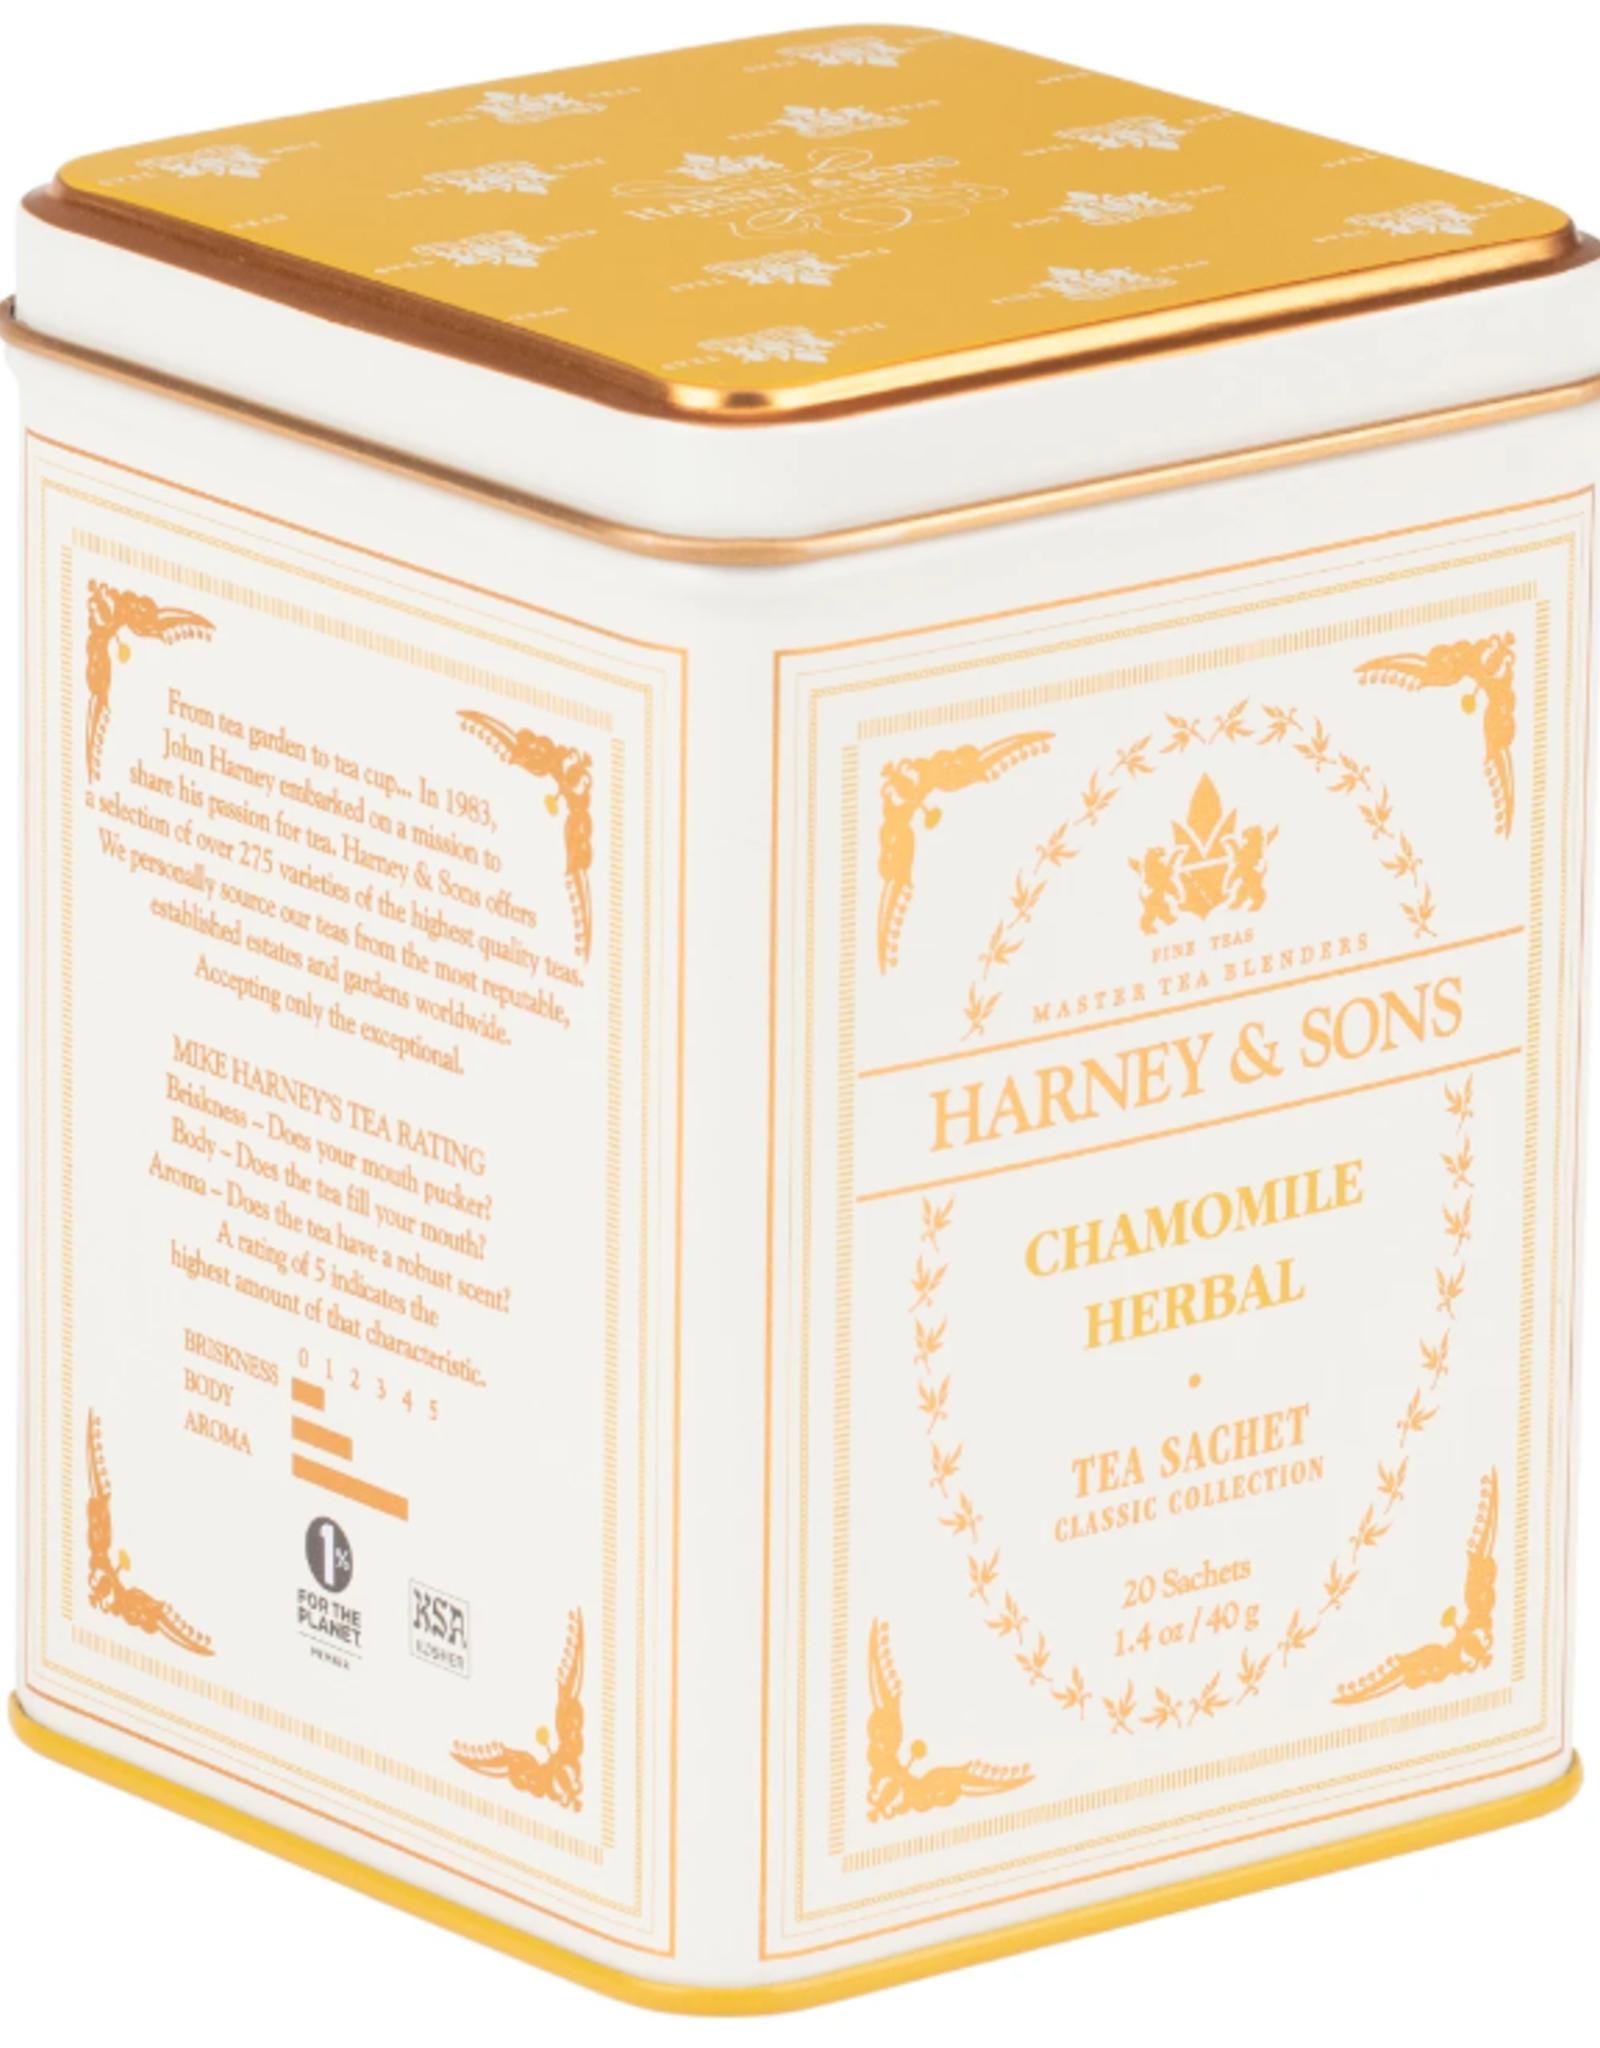 Harney & Sons Chamomile Herbal Tea, Tin